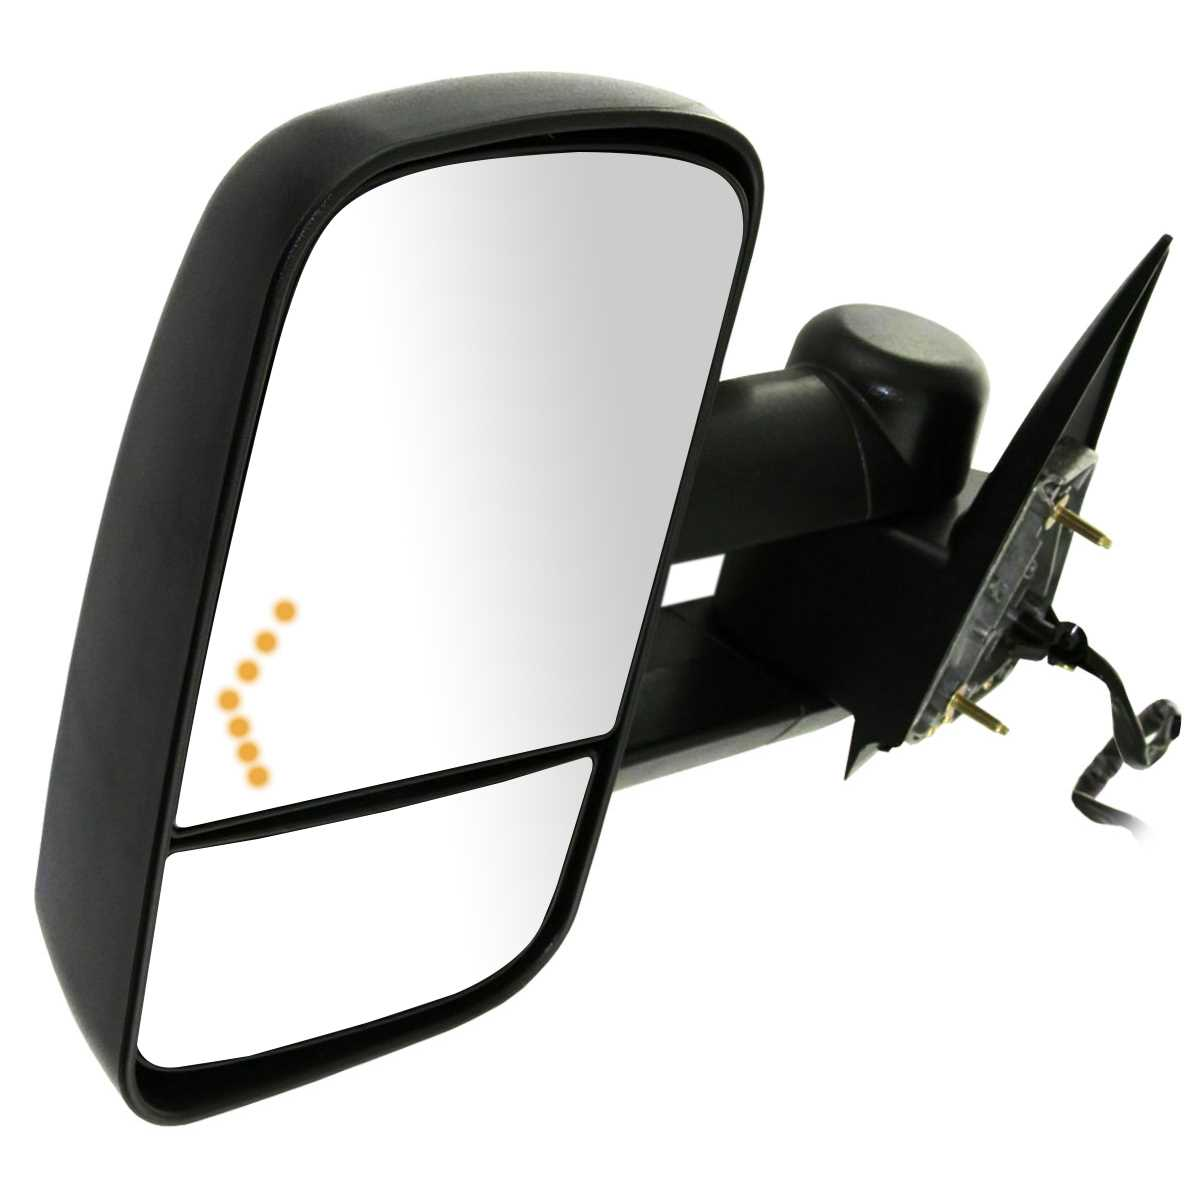 Pair-2-Power-Heated-Signal-Side-Mirror-Fits-2003-2006-Chevrolet-Silverado-1500 thumbnail 3